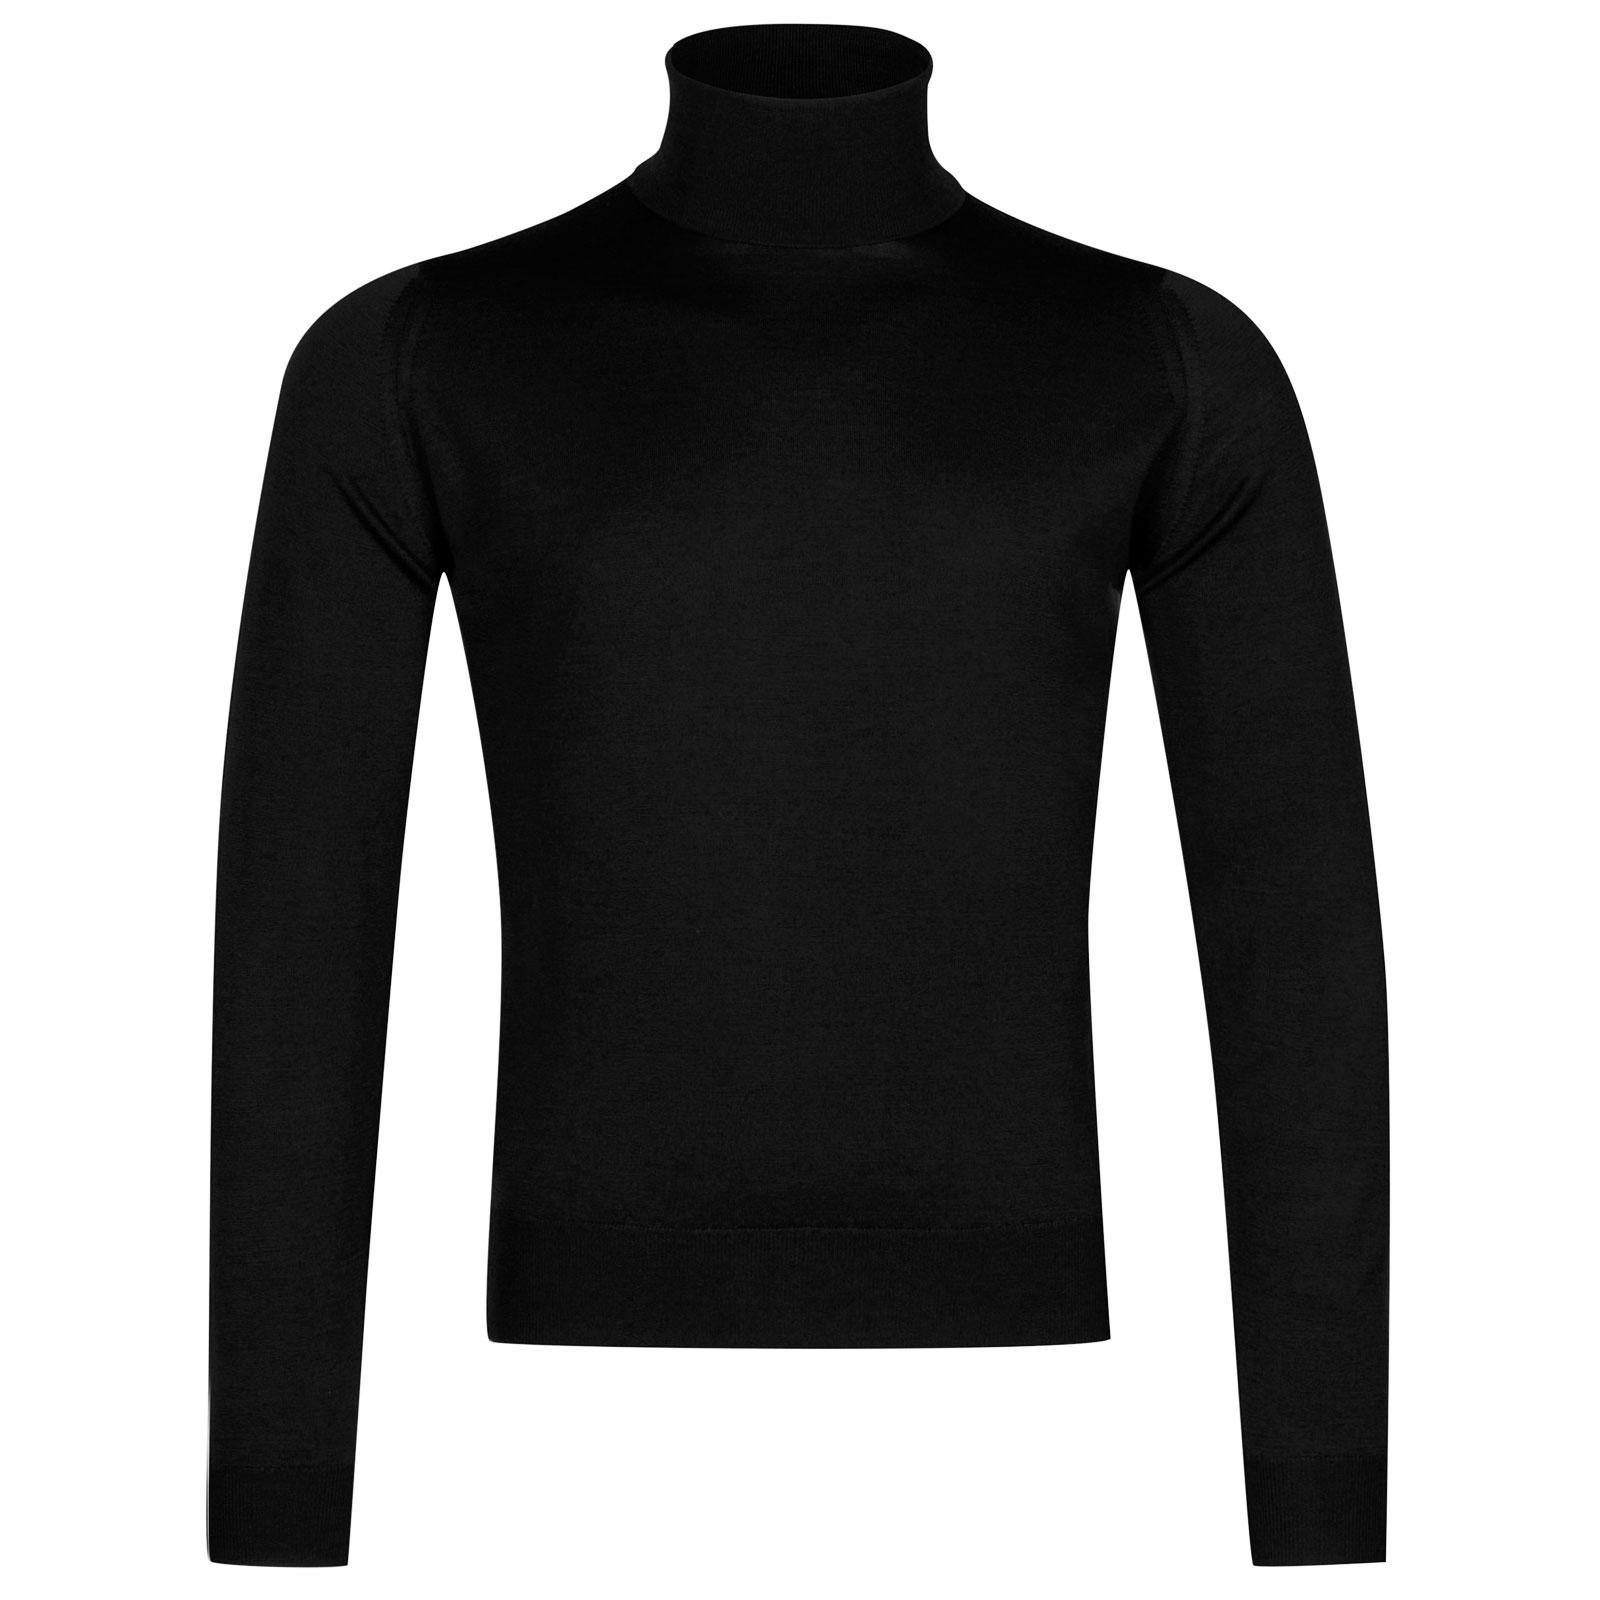 John Smedley Orta Merino Wool Pullover in Black-S